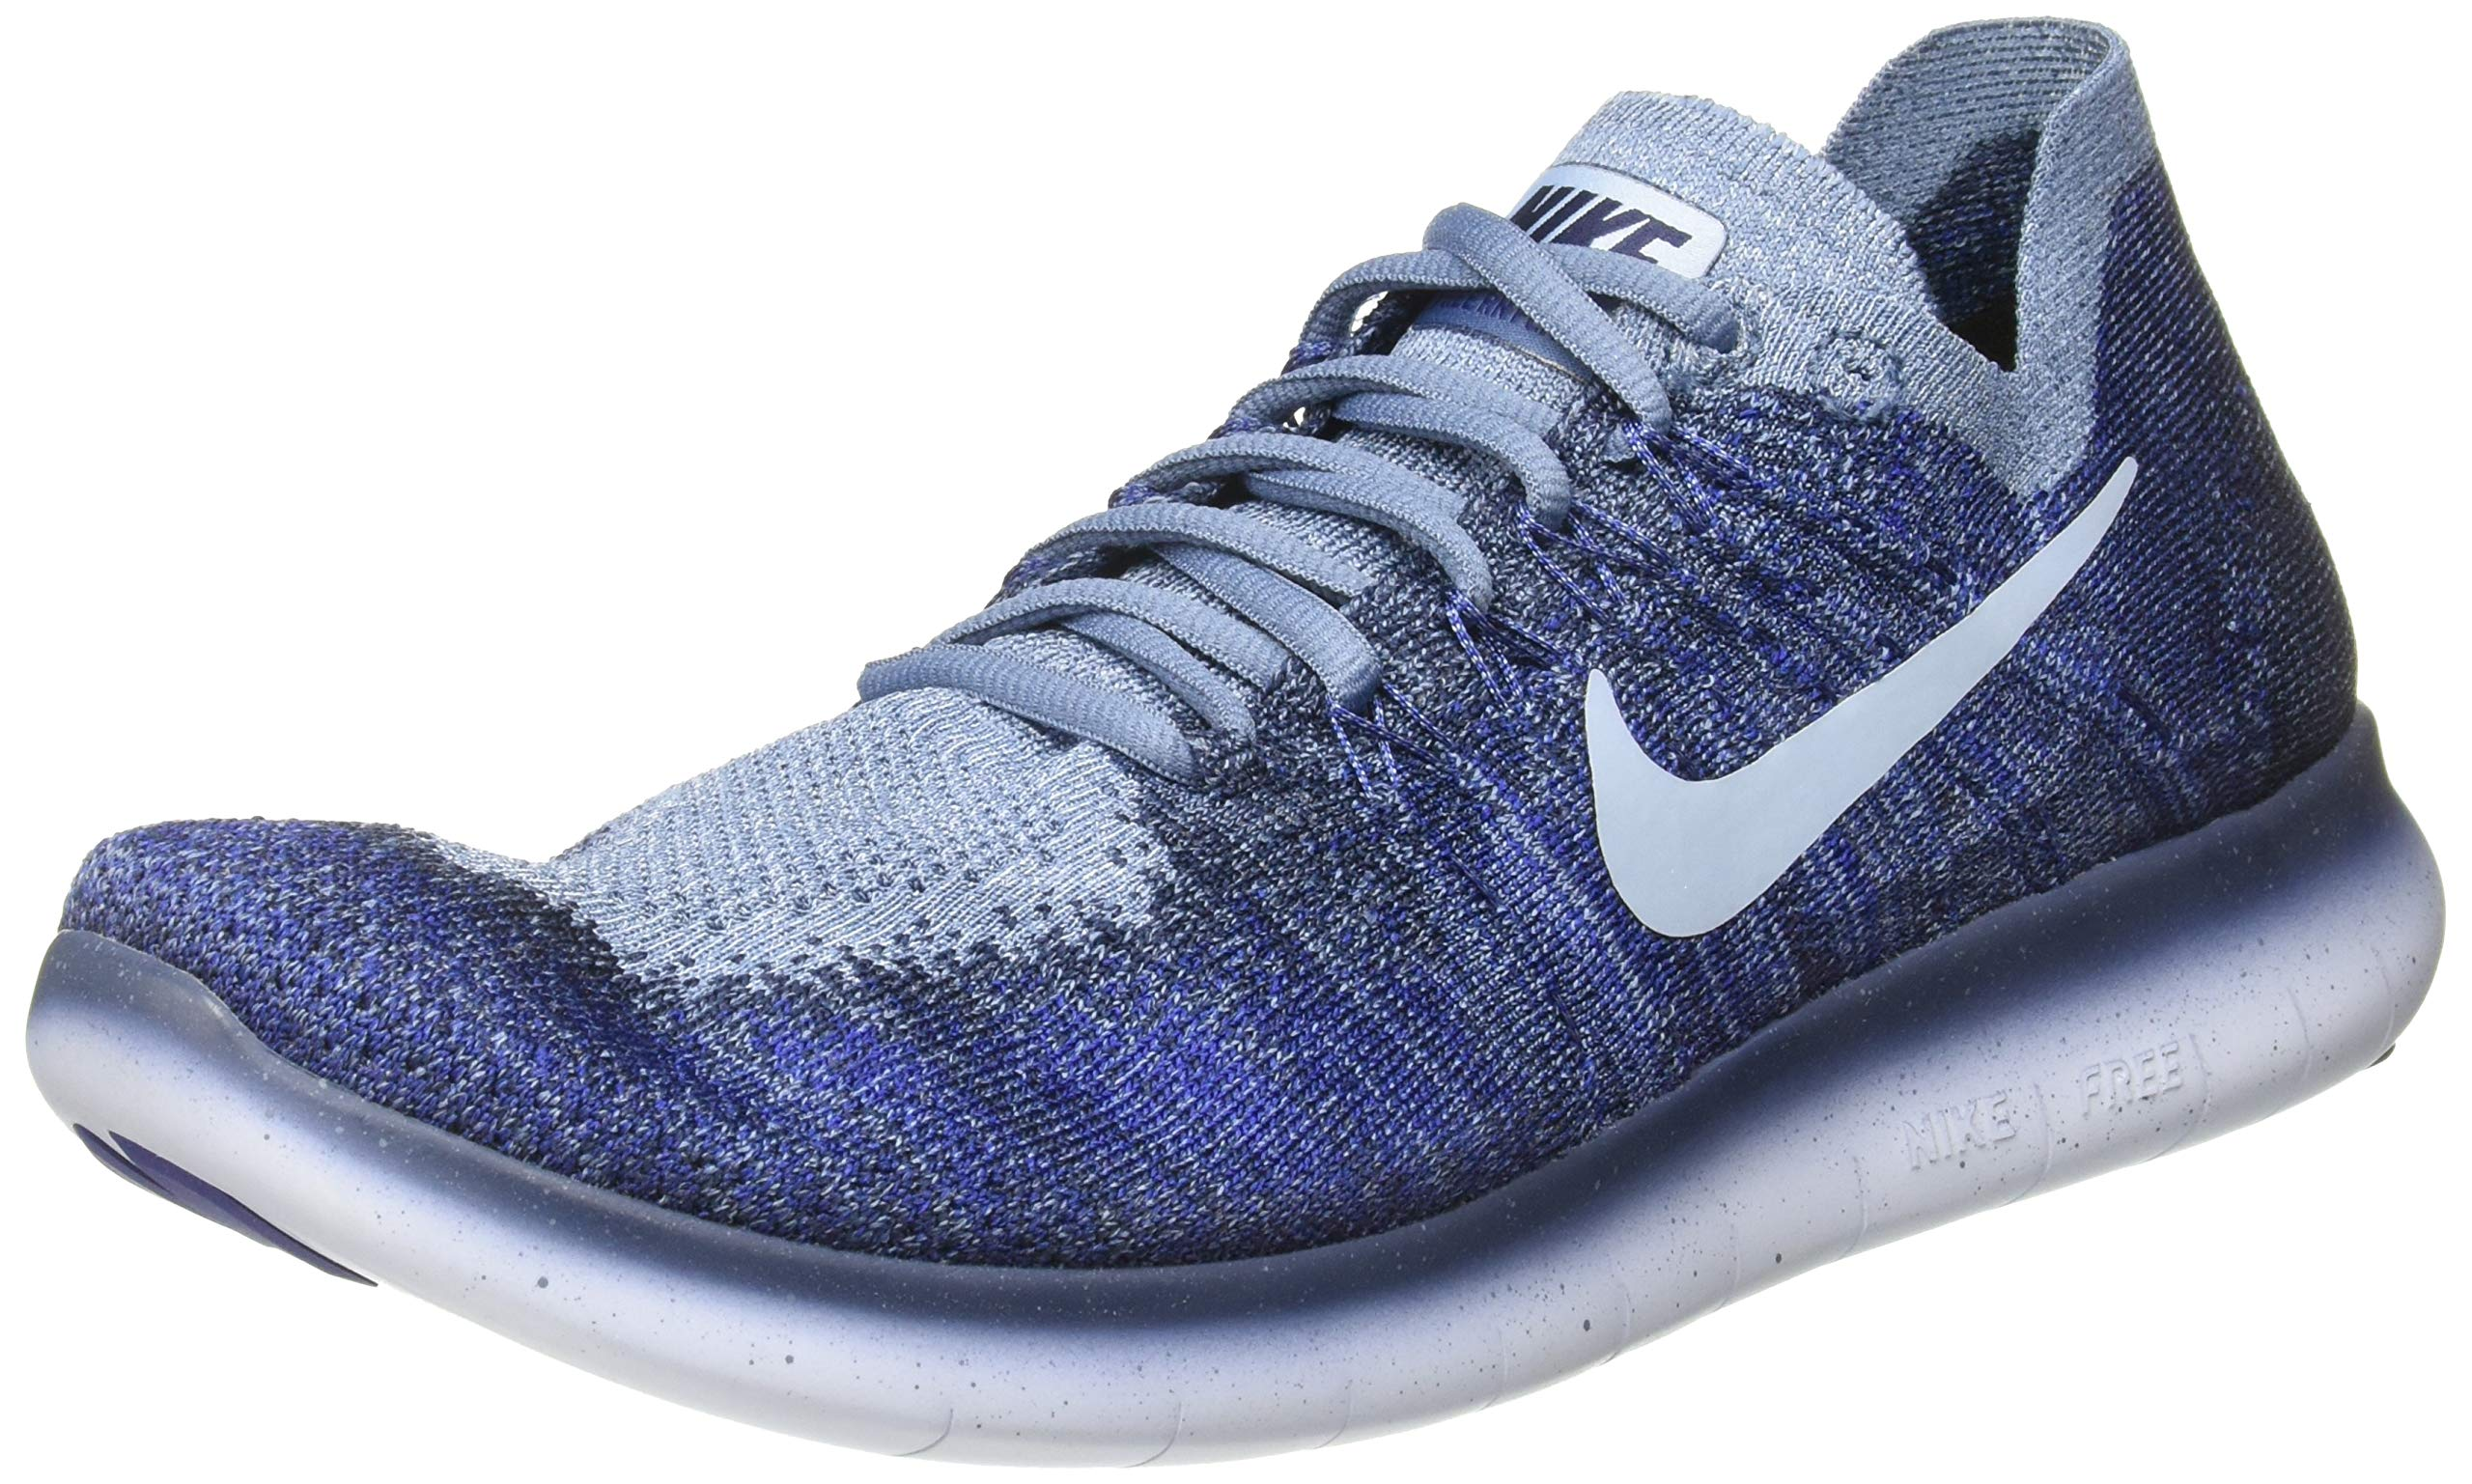 Nike Men's Free RN Flyknit 2017 Running Shoe Ocean FogCirrus Blue College Navy 9.0